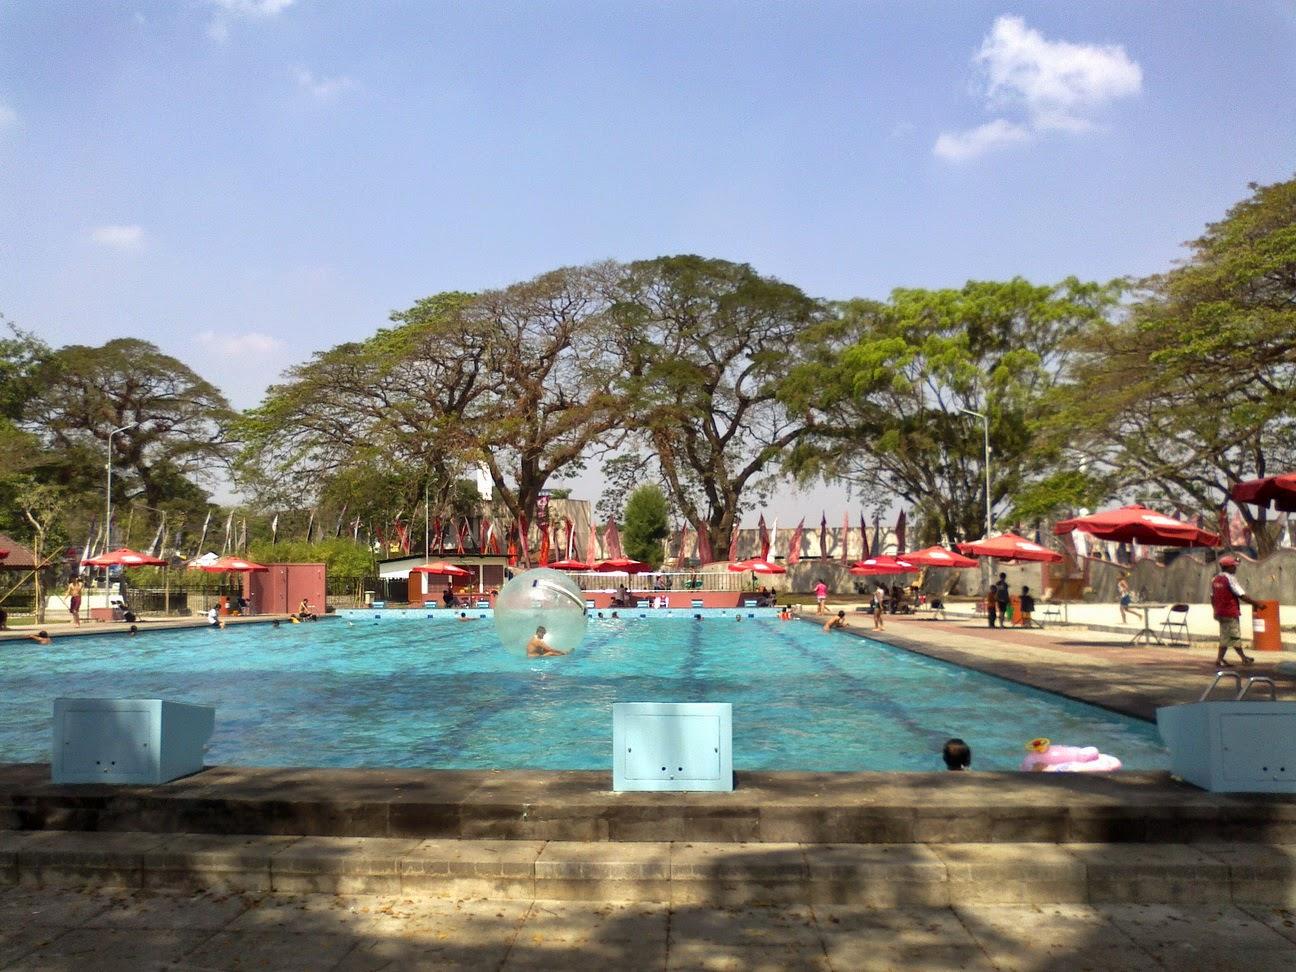 Wisata Air Kediri Taman Tirtoyoso Terletak Pusat Kota Tepatnya Jl